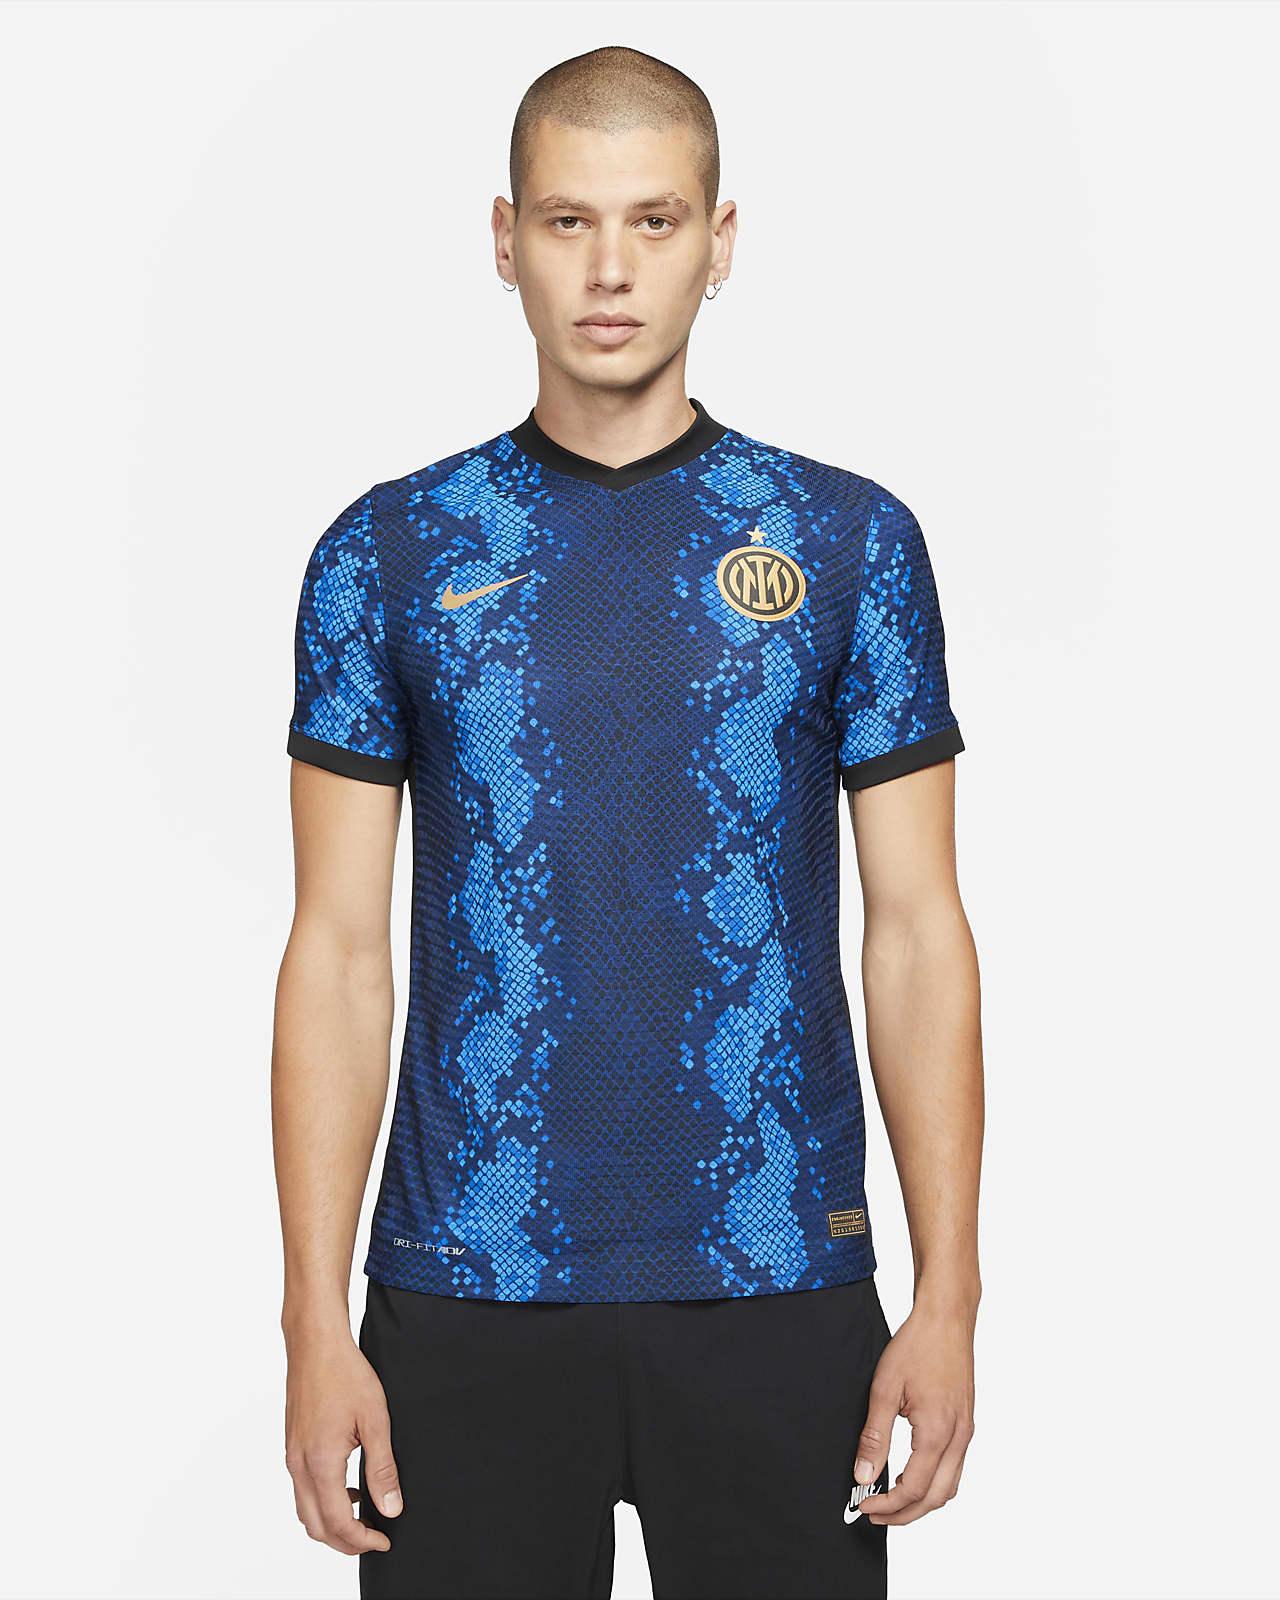 Inter Milan 2021/22 Match Home Men's Nike Dri-FIT ADV Football Shirt